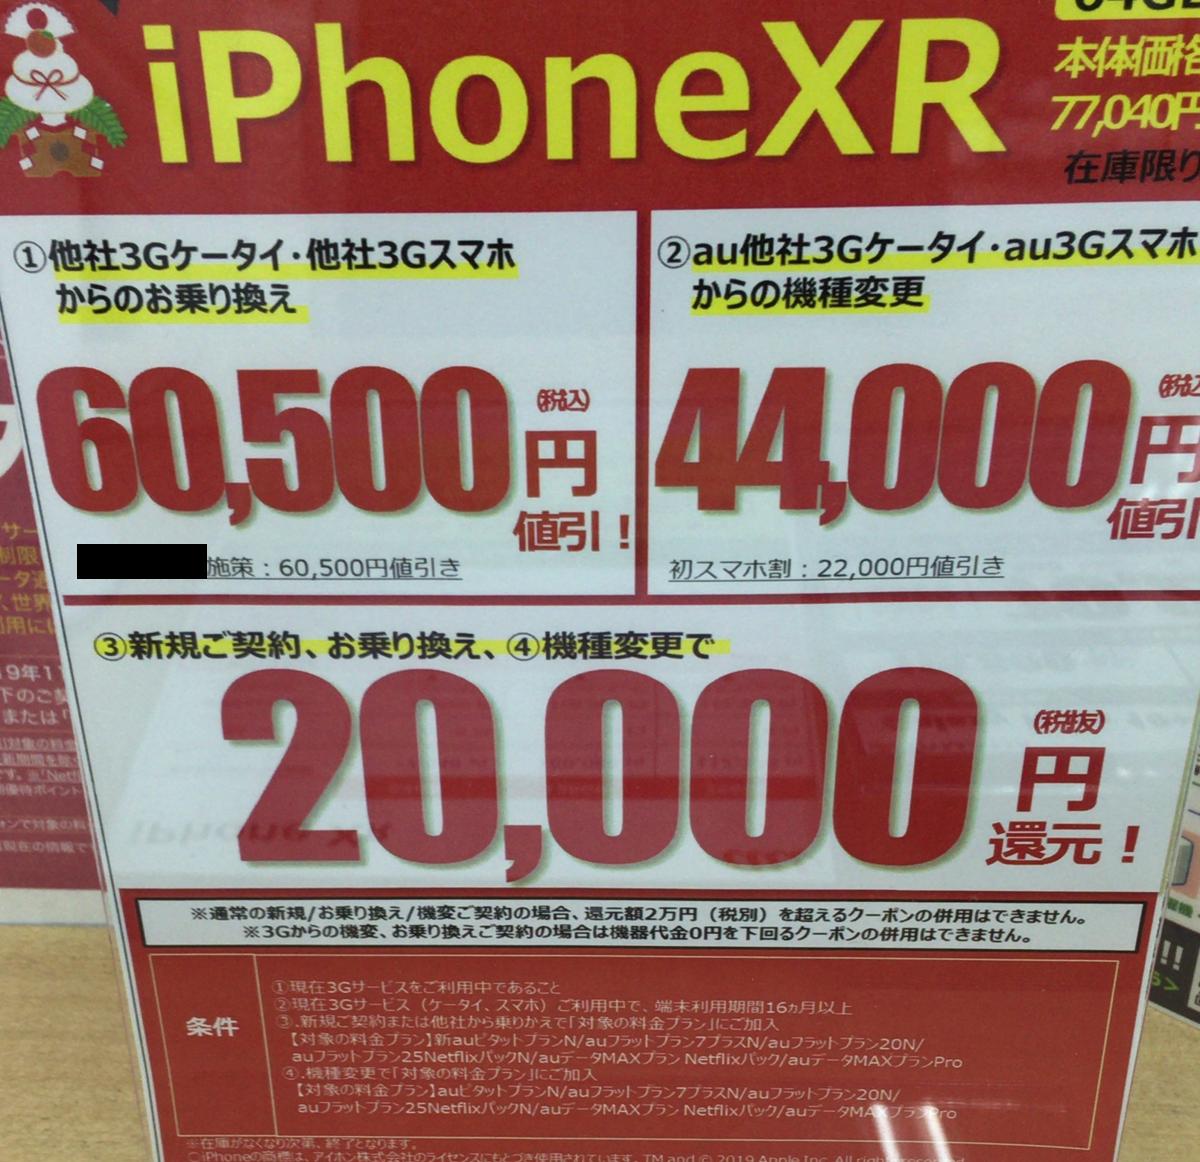 f:id:koiwai_chinatsu:20200106215147p:plain